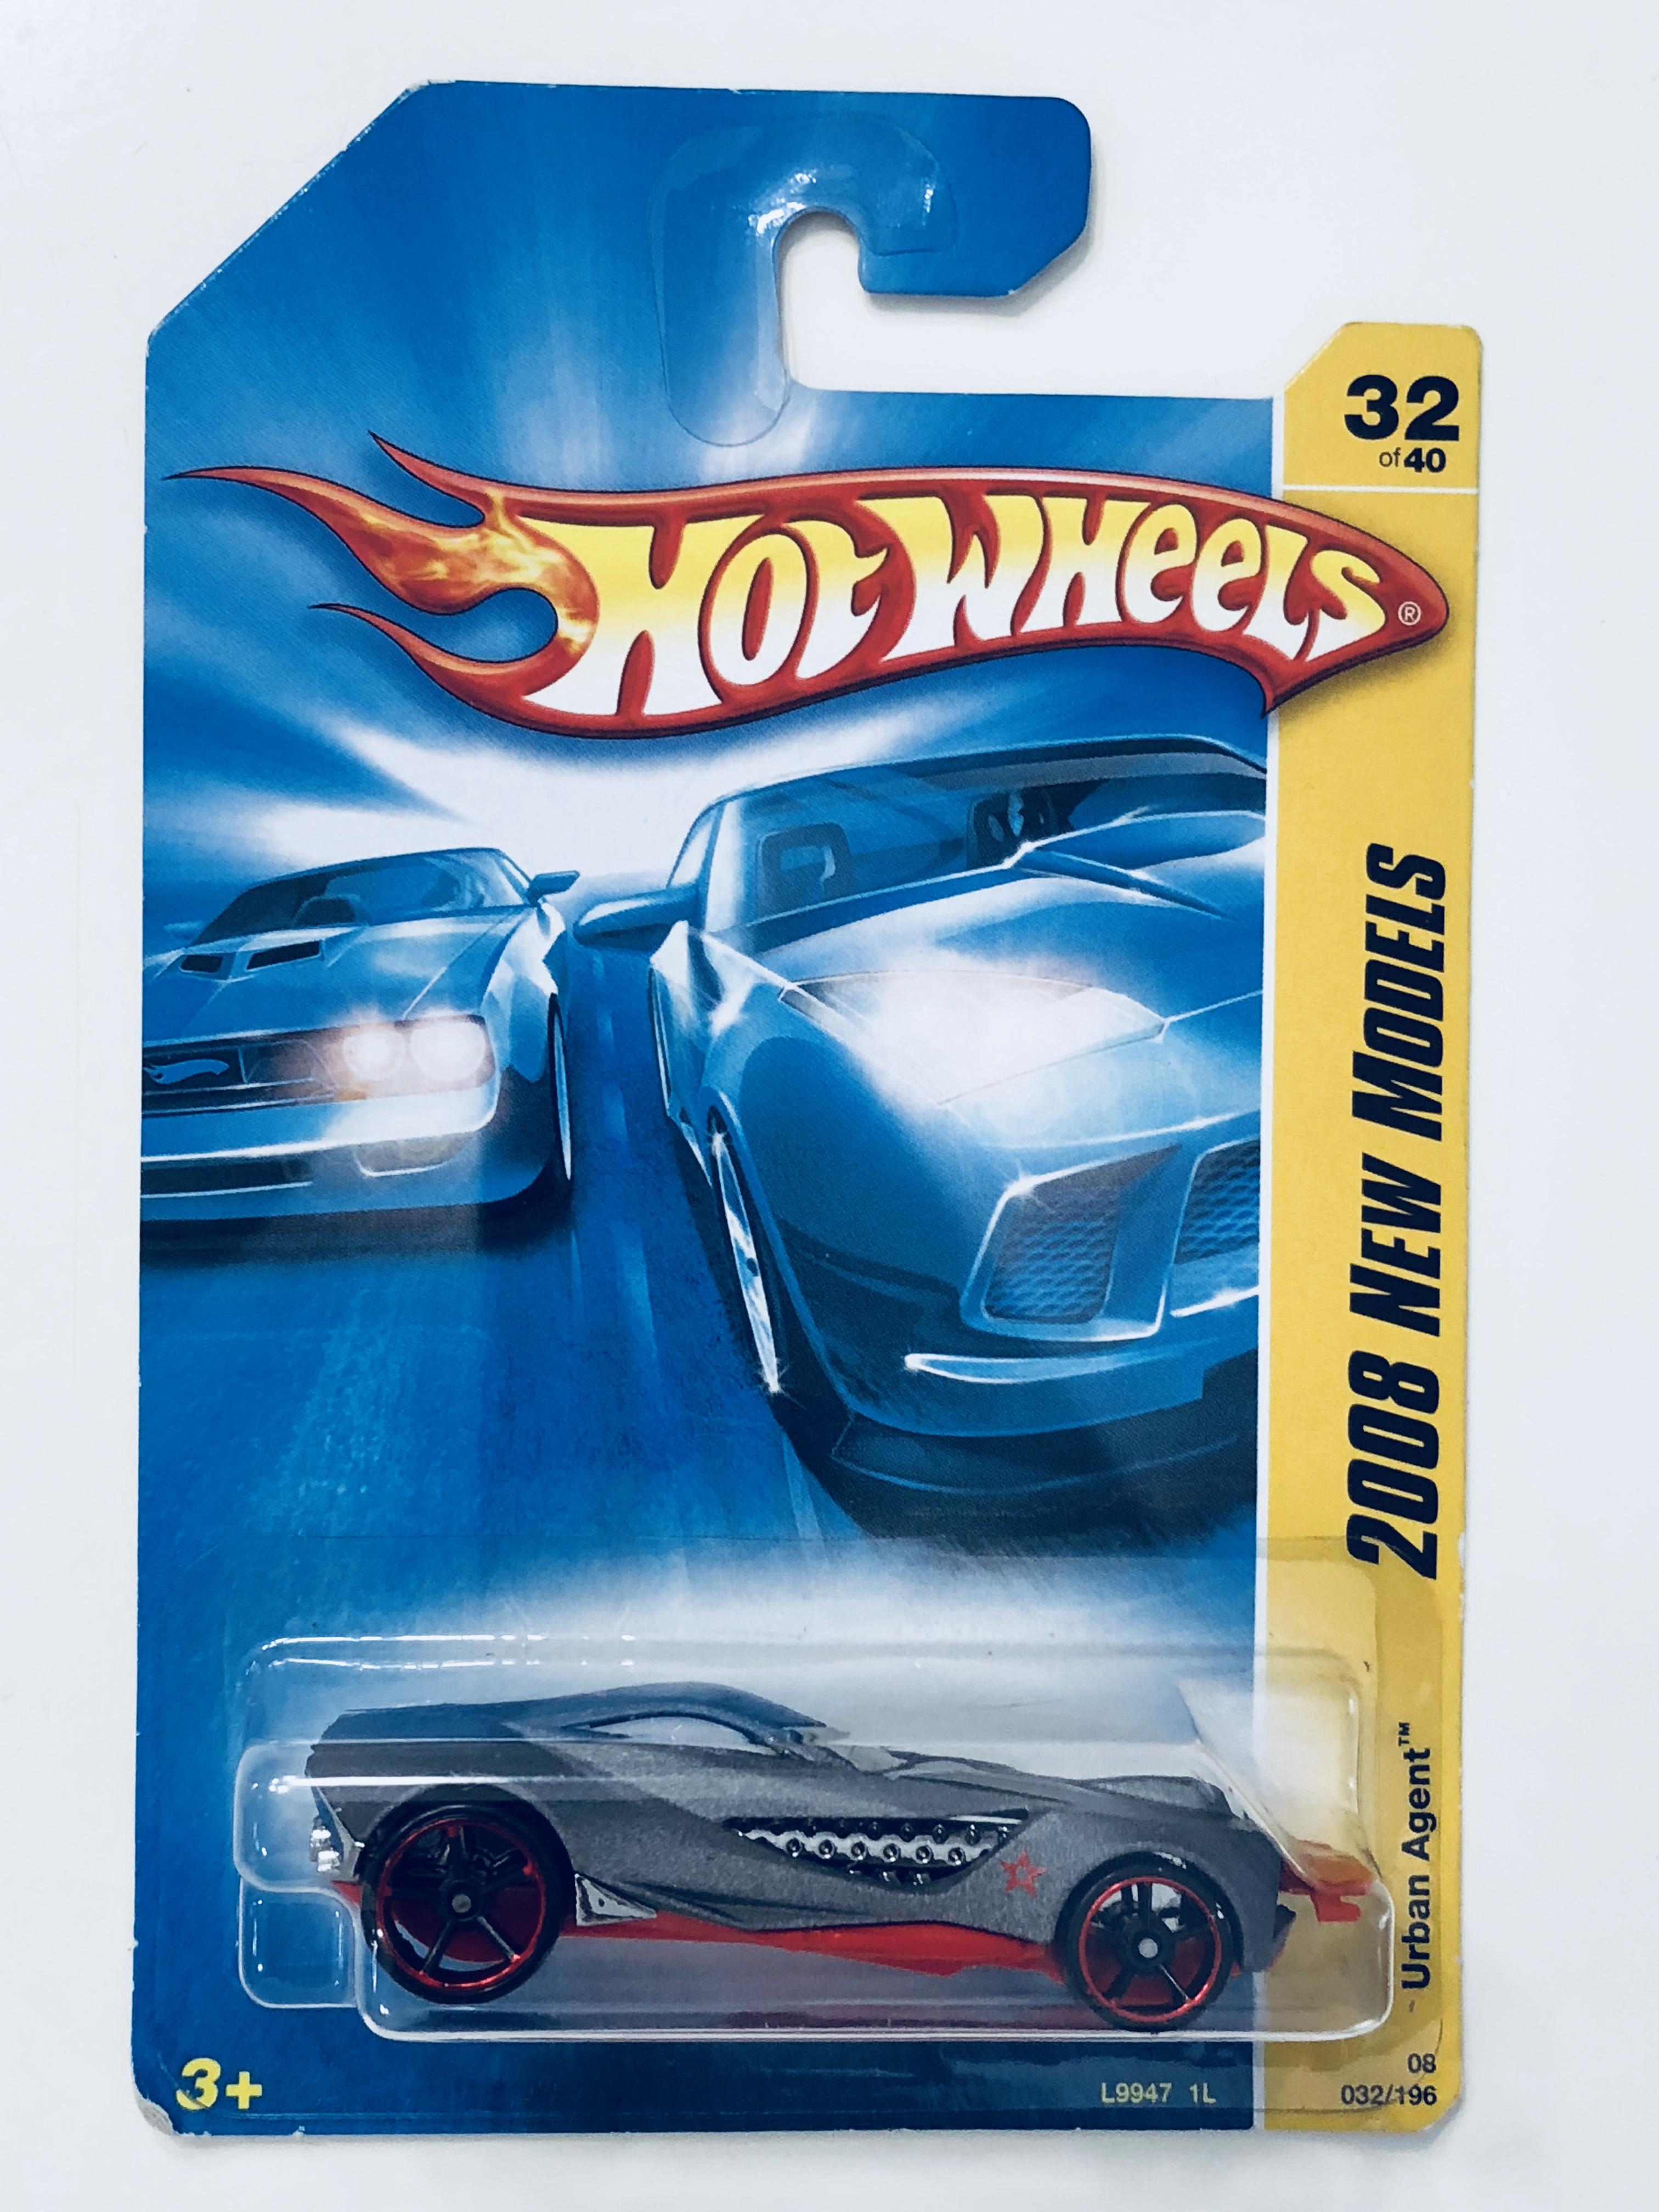 Urban Agent Model Cars Hobbydb